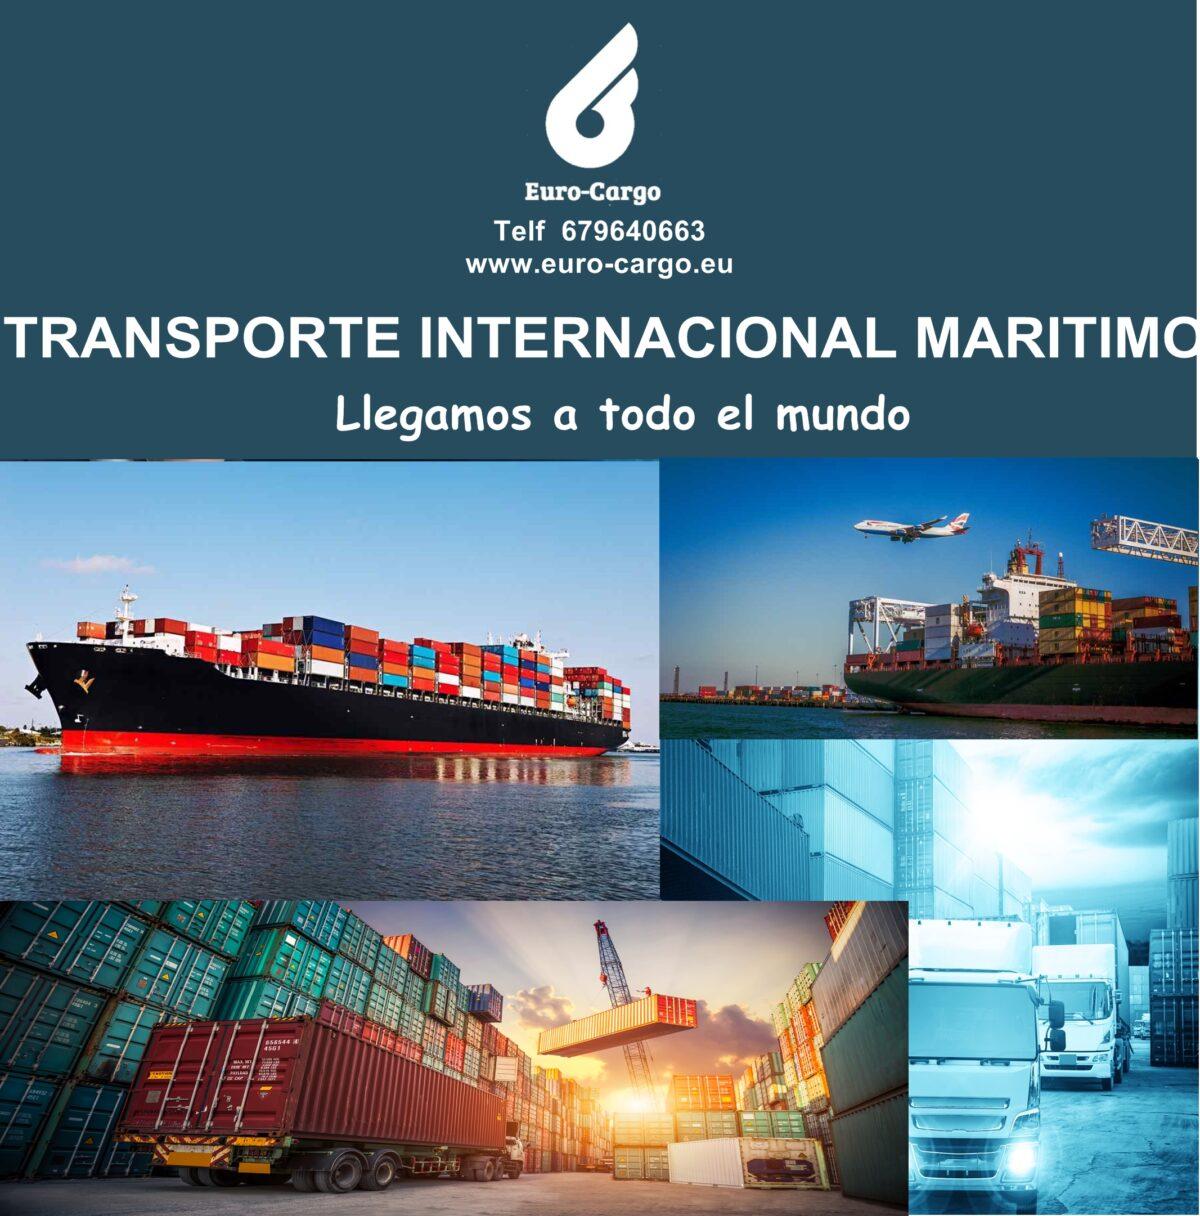 Transporte-Internacional-Maritimo-1200x1216.jpg